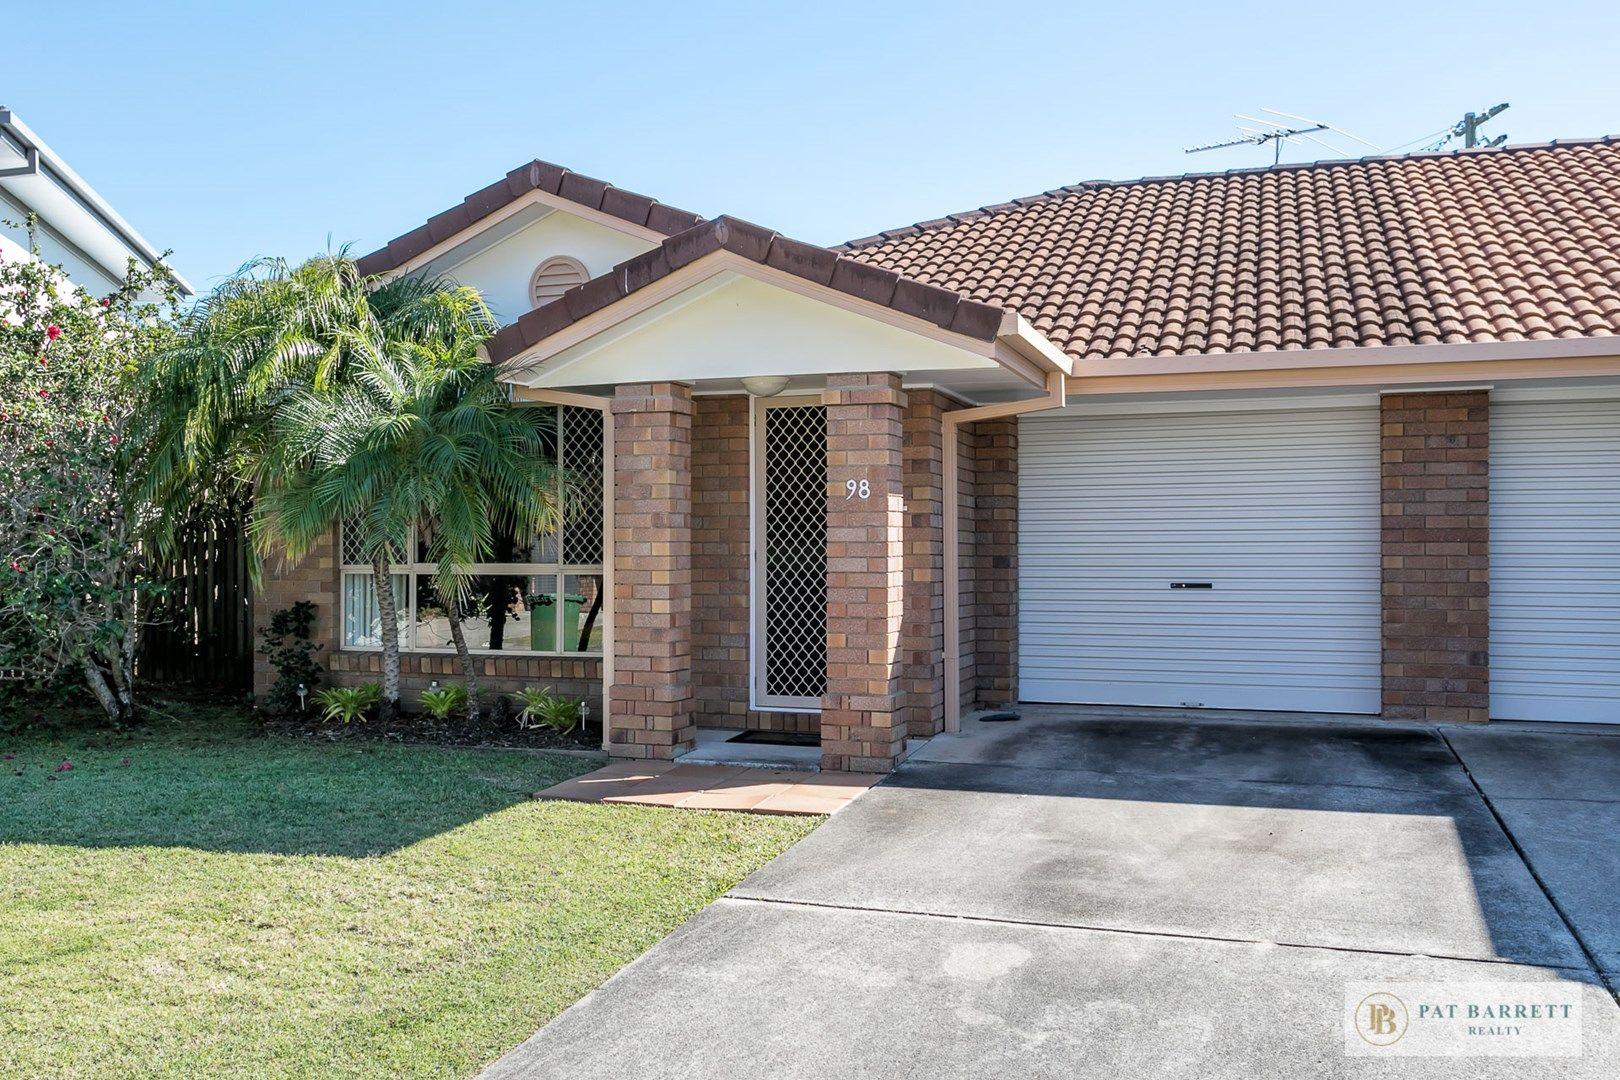 98/205 Thorneside Road, Thorneside QLD 4158, Image 0